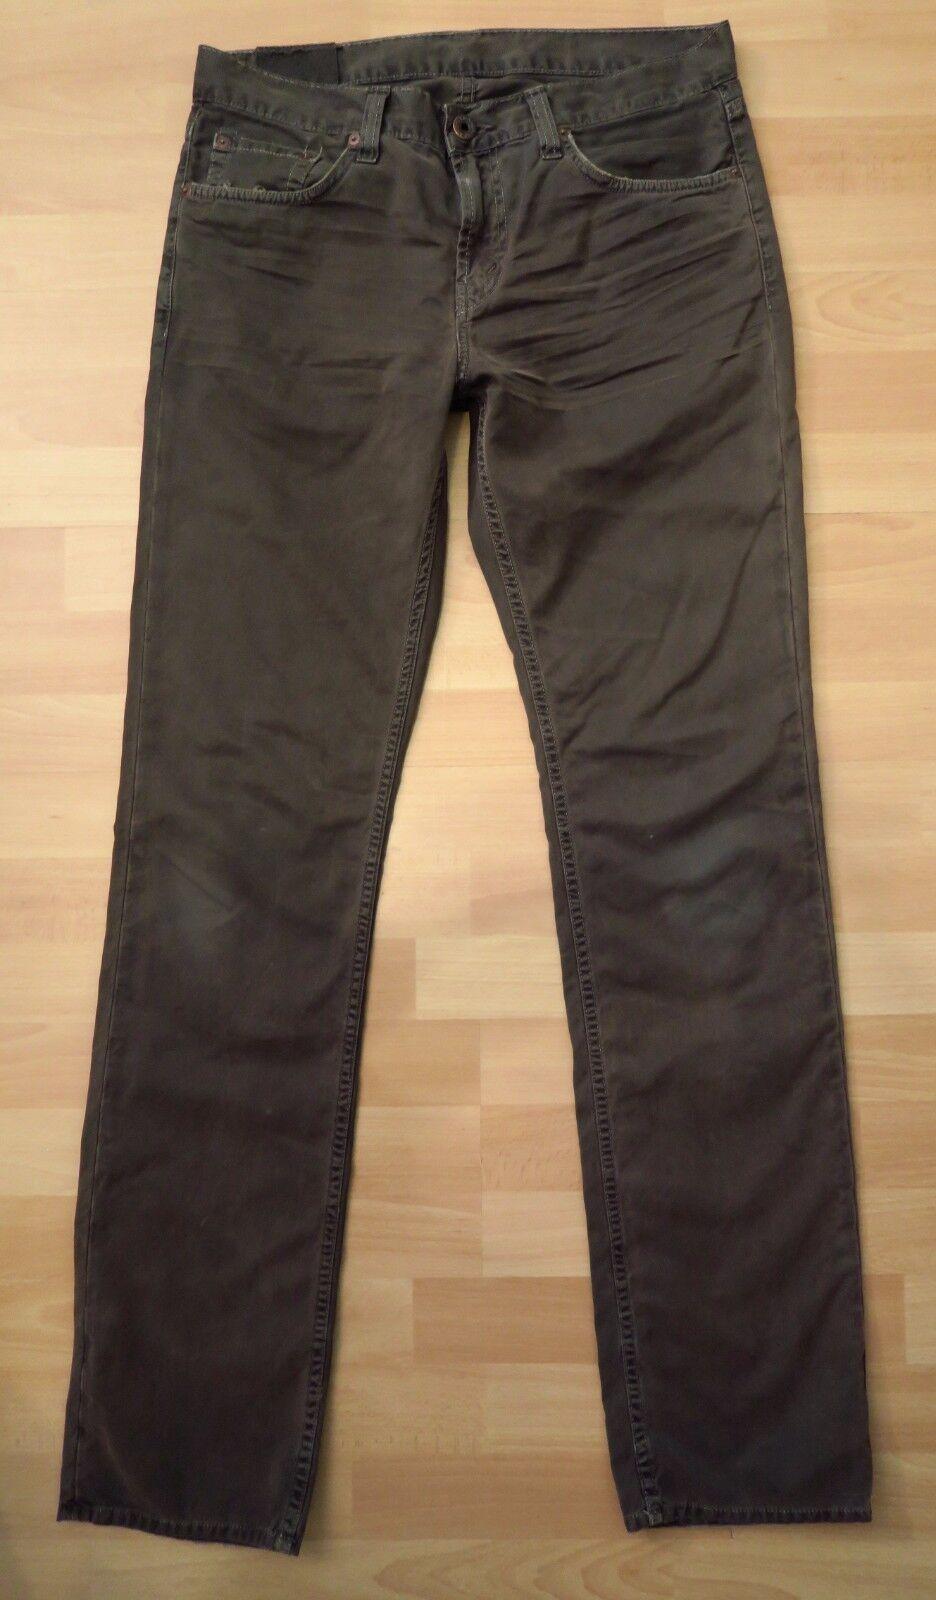 J. BRAND Pantalon np179 € W Marron 32 l/52 Marron W Pantalon homme chinos Marron stoffhose 0b392f